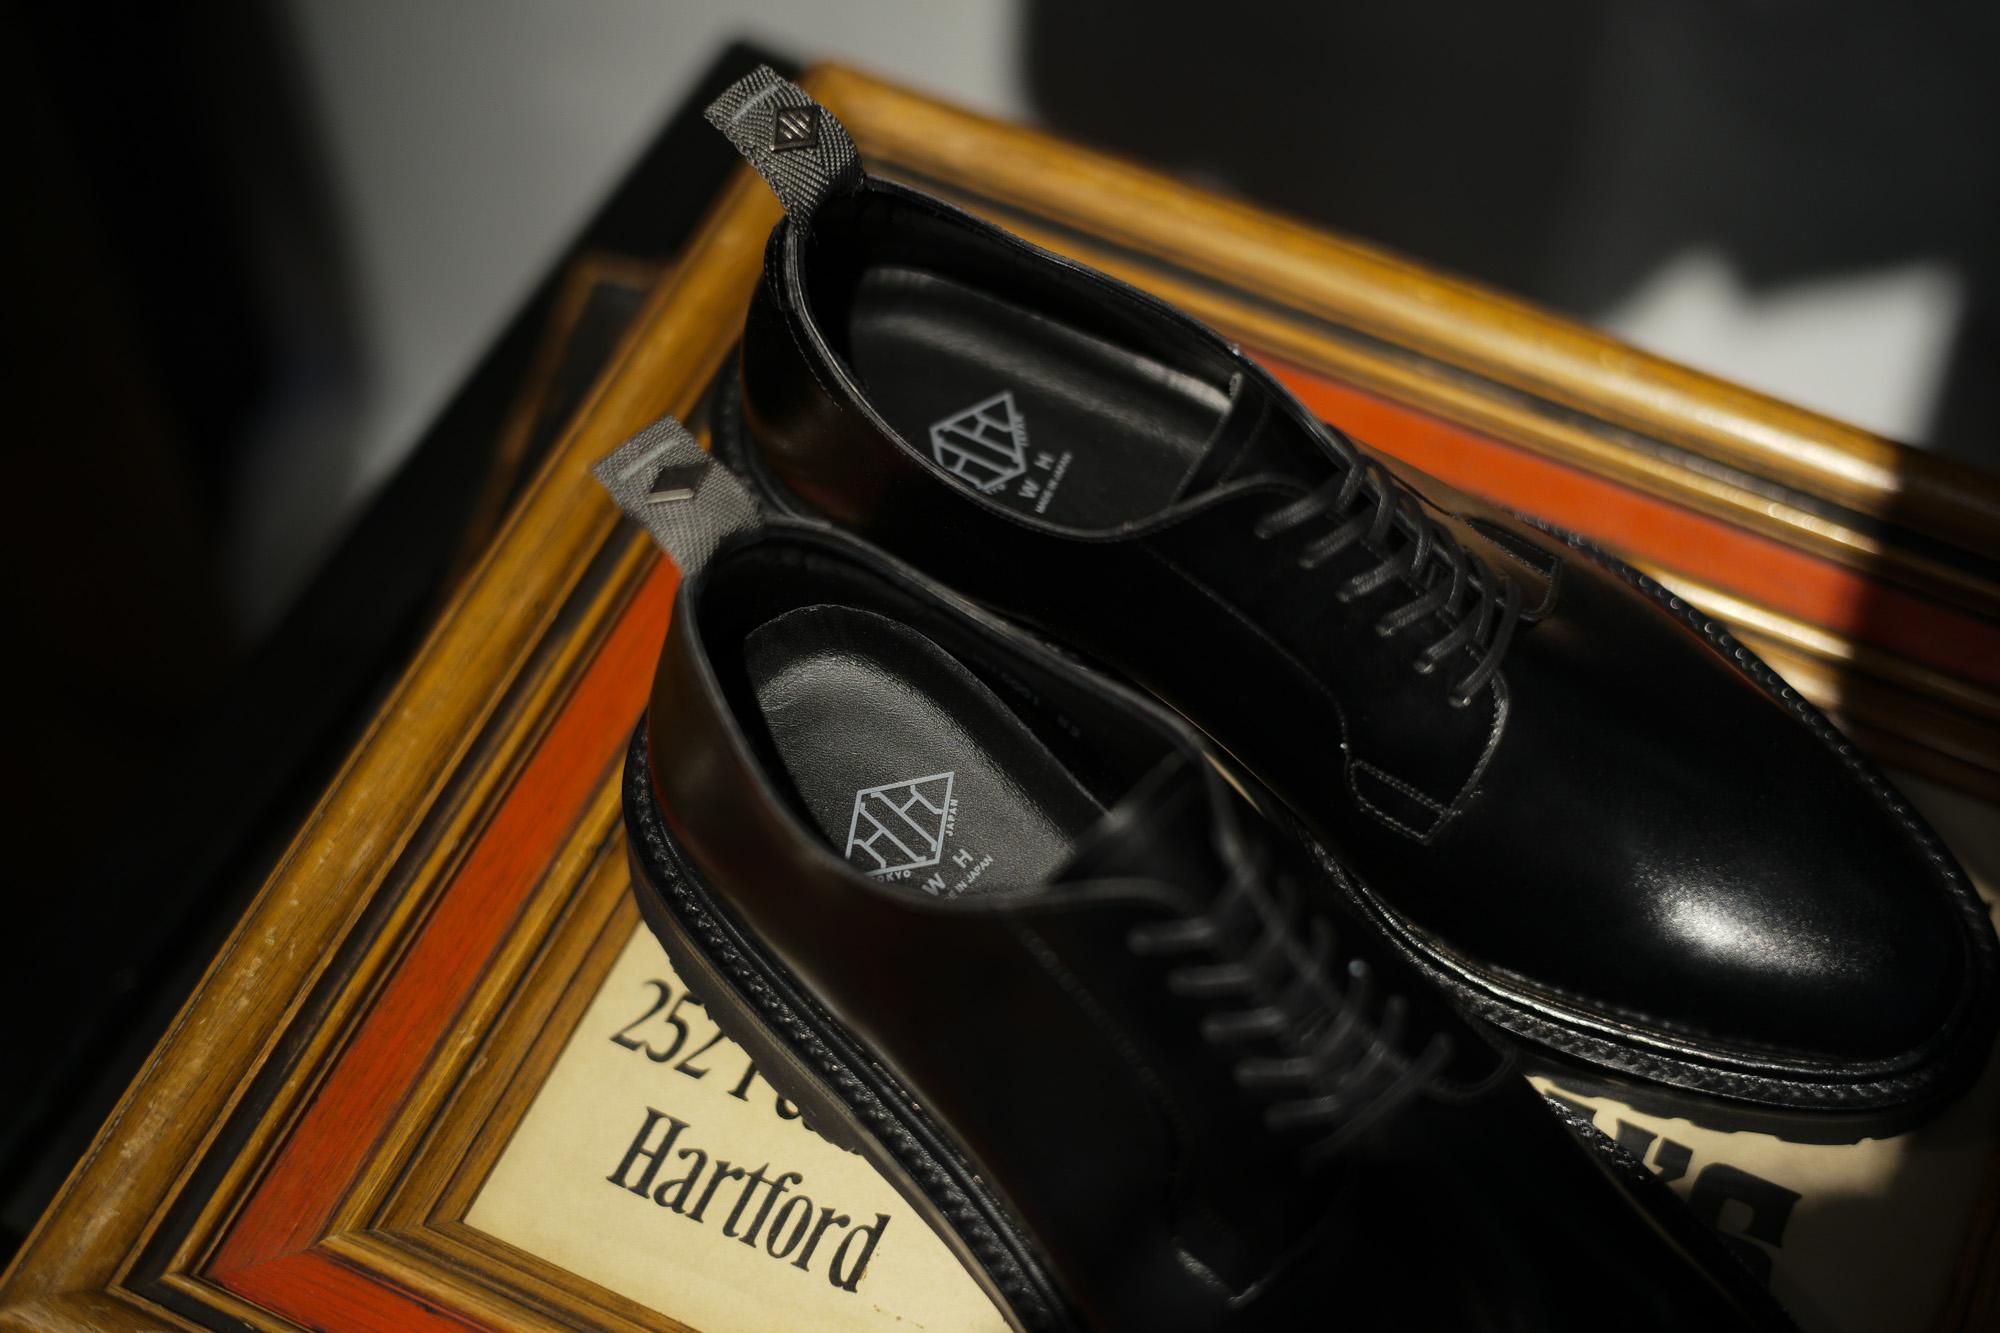 WH (ダブルエイチ) WH-0001(WHS-0001) Plane Toe Shoes (干場氏 スペシャル モデル) Cruise Last (クルーズラスト) ANNONAY Vocalou Calf Leather プレーントゥシューズ BLACK (ブラック) MADE IN JAPAN(日本製) 2018 春夏新作   【干場氏、坪内氏の直筆サイン入り】【Alto e Diritto限定 スペシャルアイテム】wh 干場さん 干場スペシャル FORZASTYLE フォルザスタイル 愛知 名古屋 Alto e Diritto アルト エ デリット